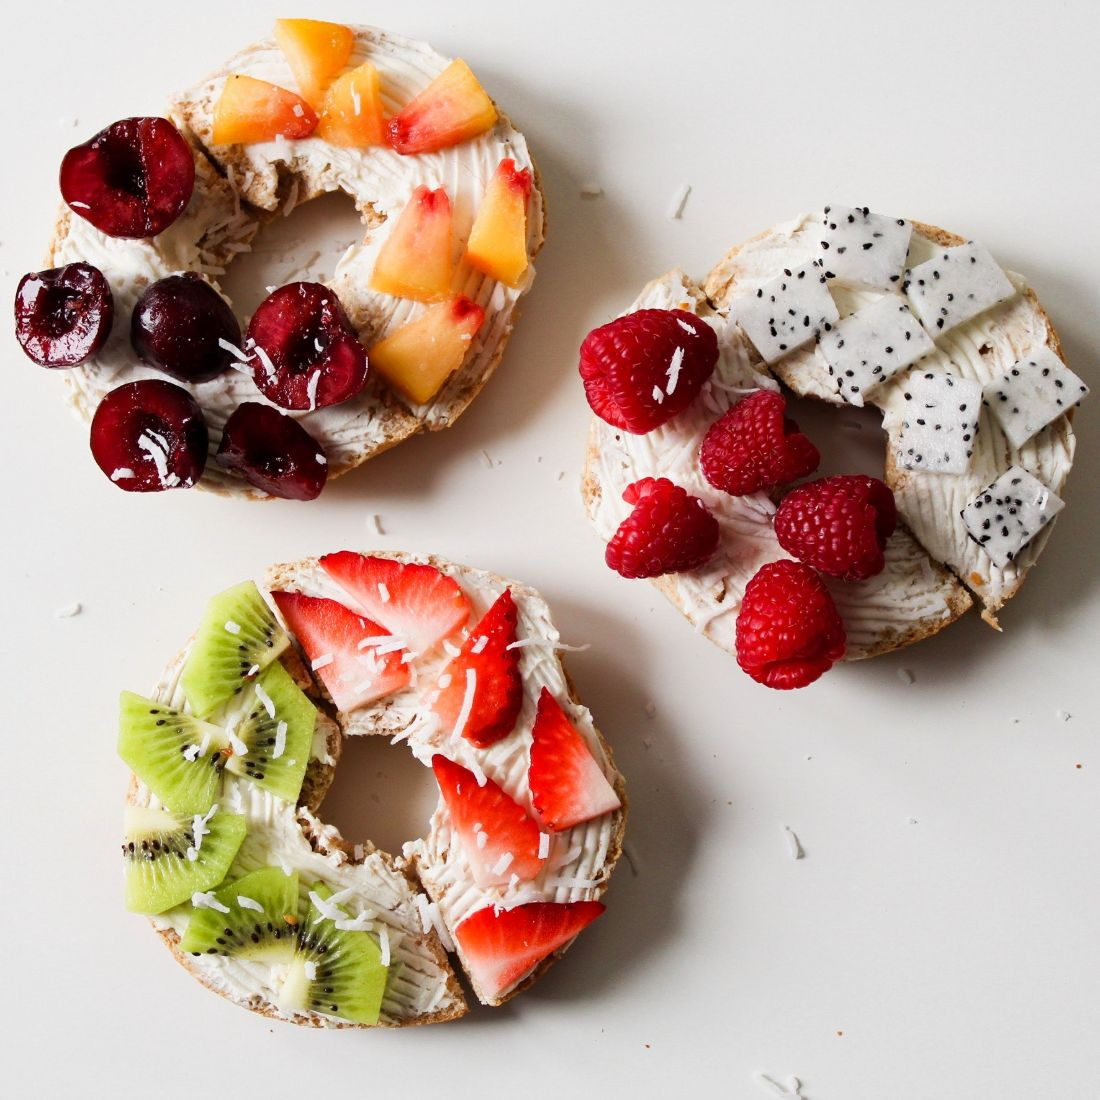 nutritivno bogati obroci, nutrivat